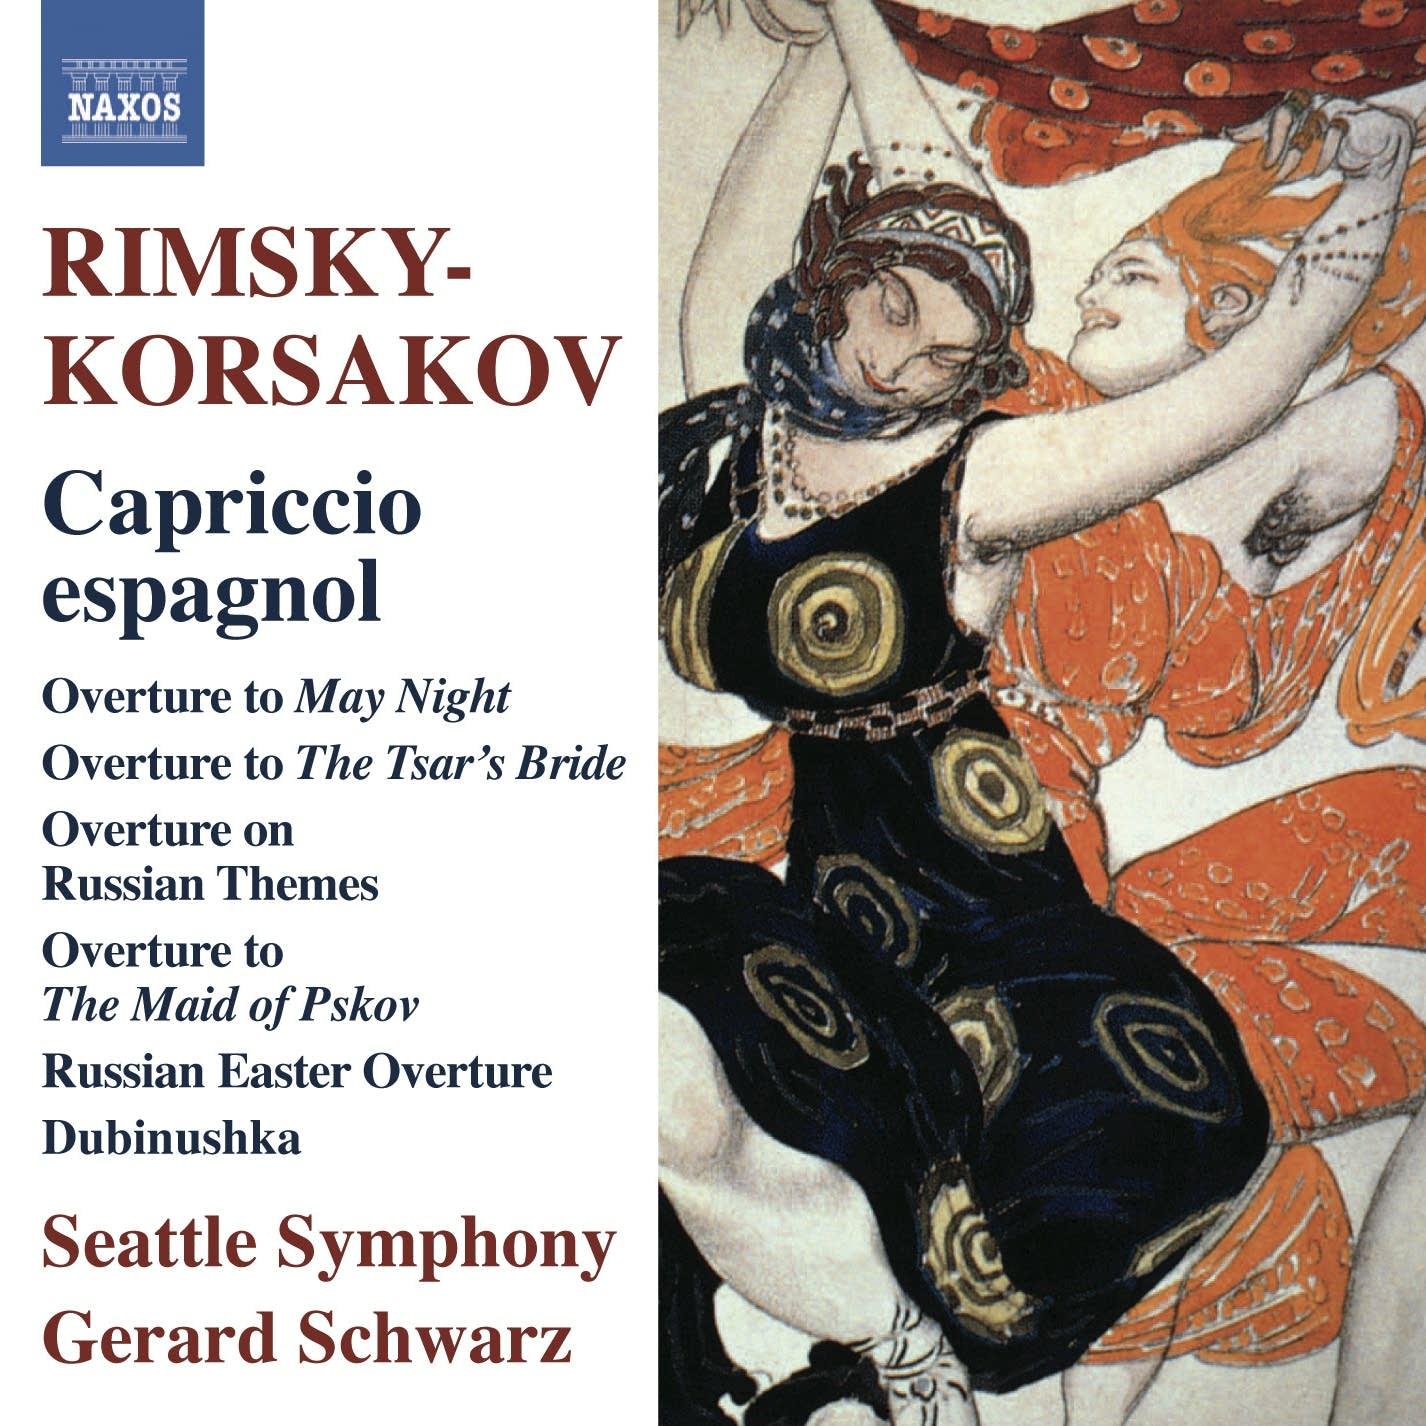 Nikolai Rimsky-Korsakov - Capriccio espagnol: Alborada